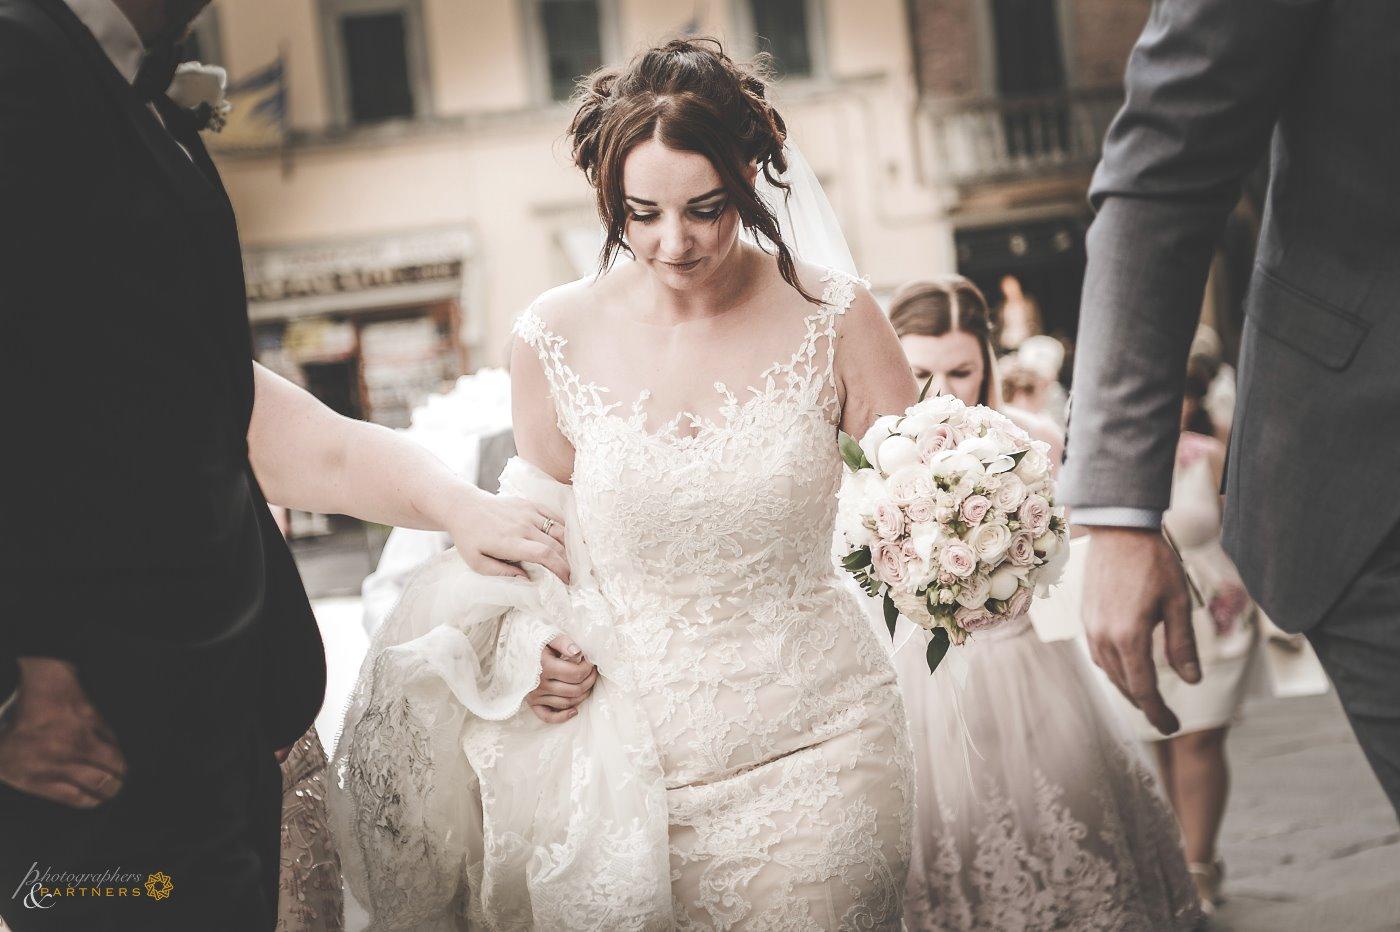 photographer_weddings_cortona_11.jpg